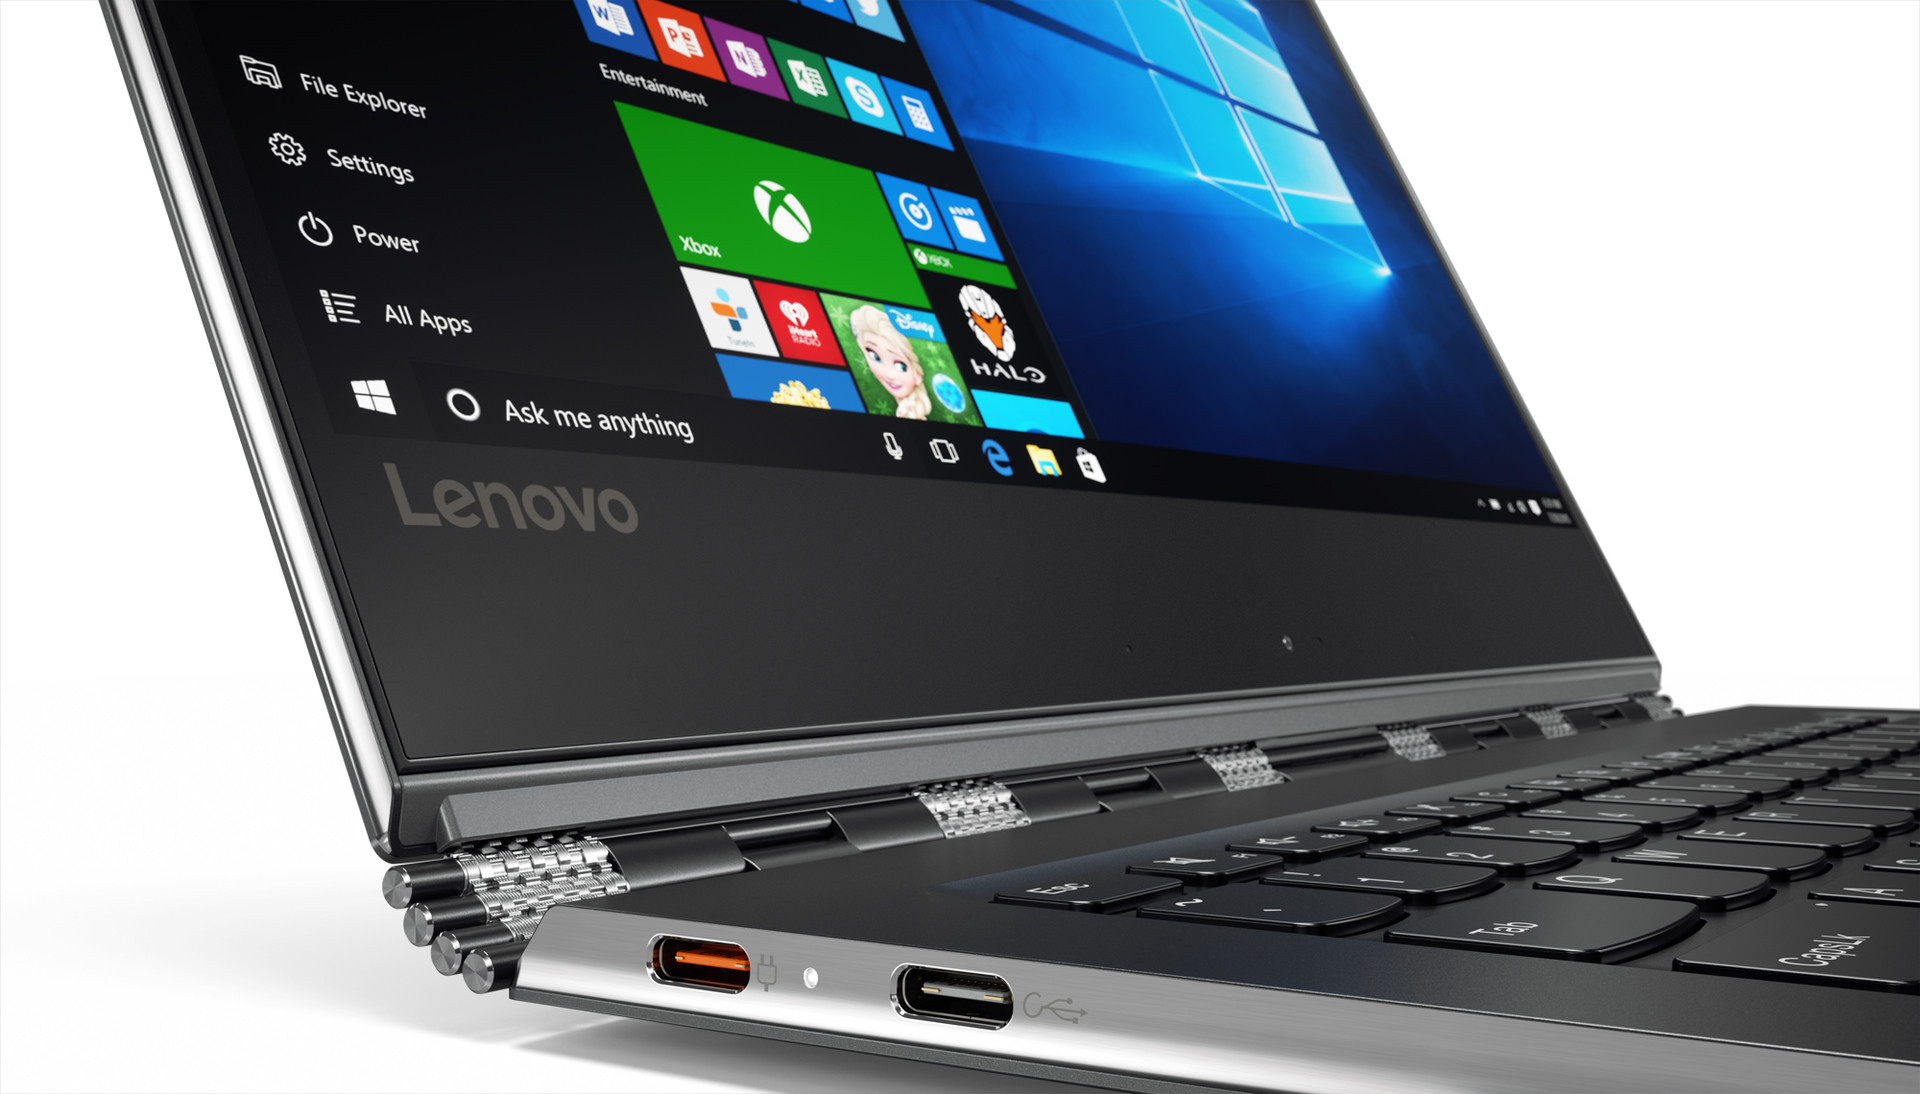 Lenovo Yoga 910 Convertible Flaggschiff Mit Kaby Lake Unibody